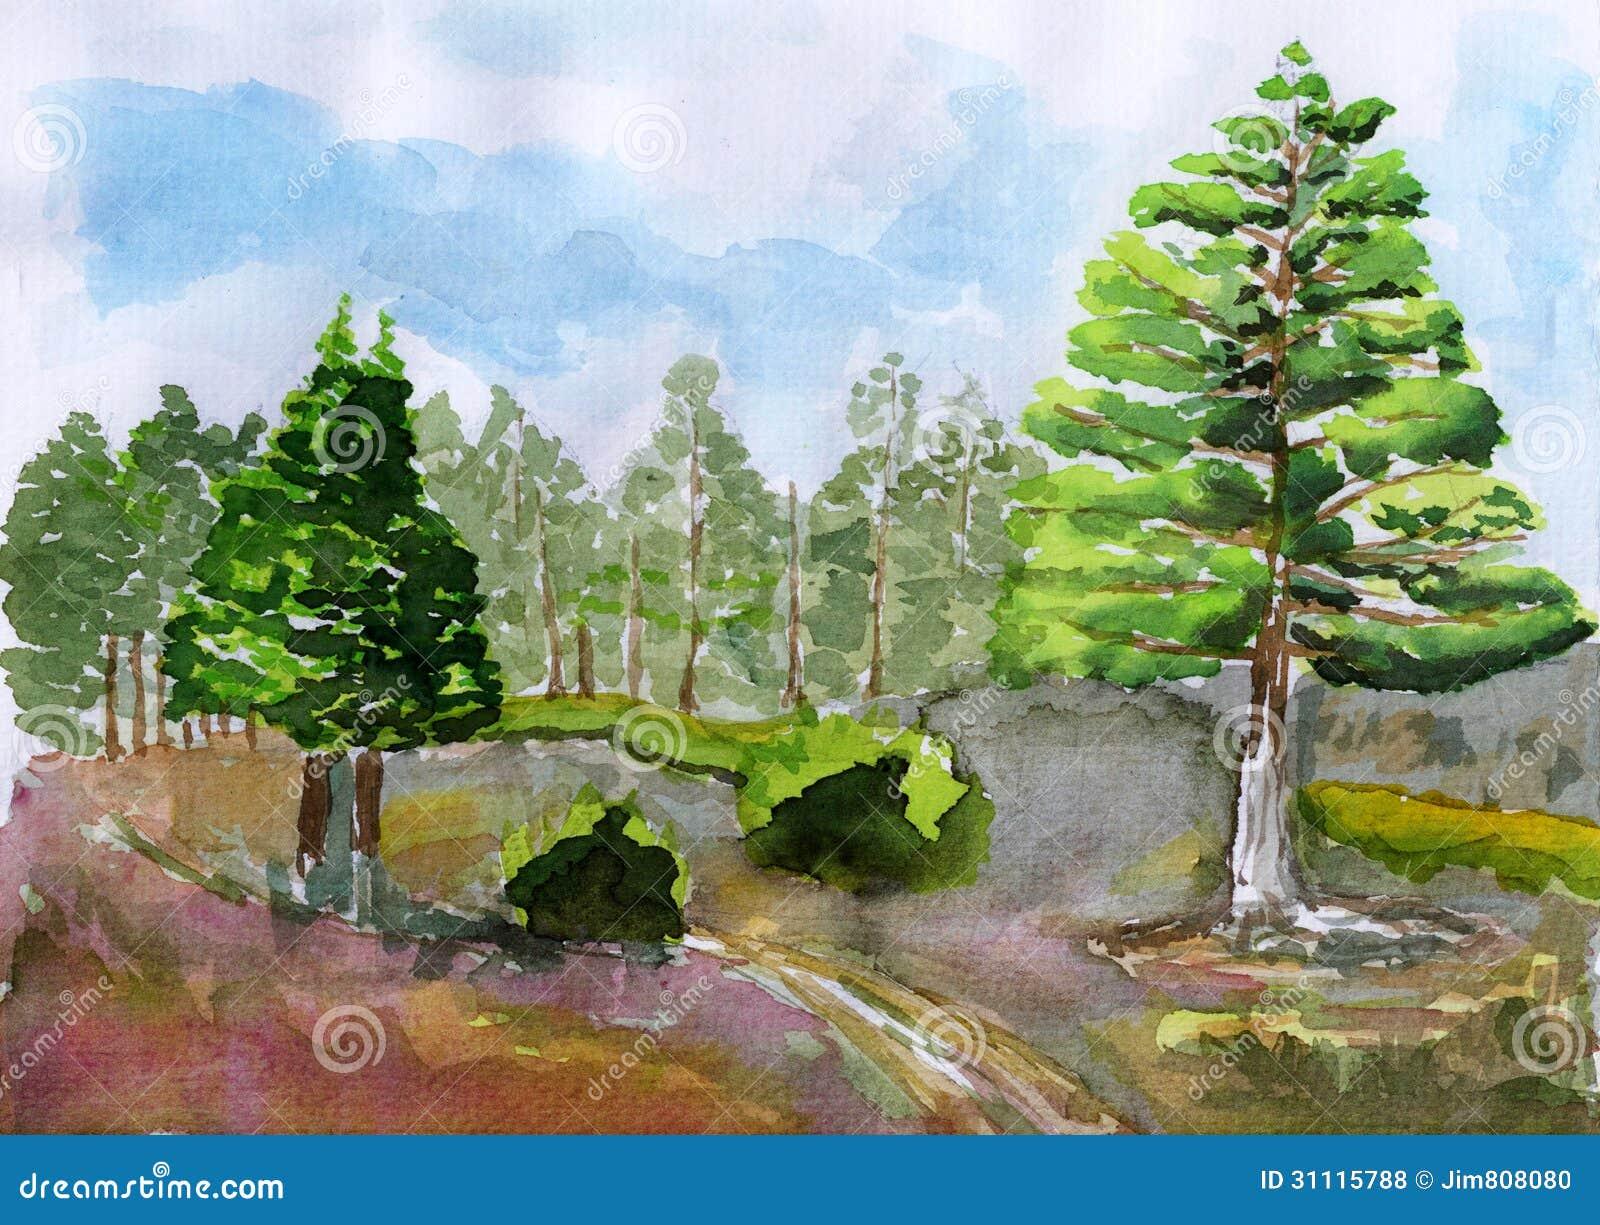 Watercolor Tree Royalty Free Stock Photos Image 31115788